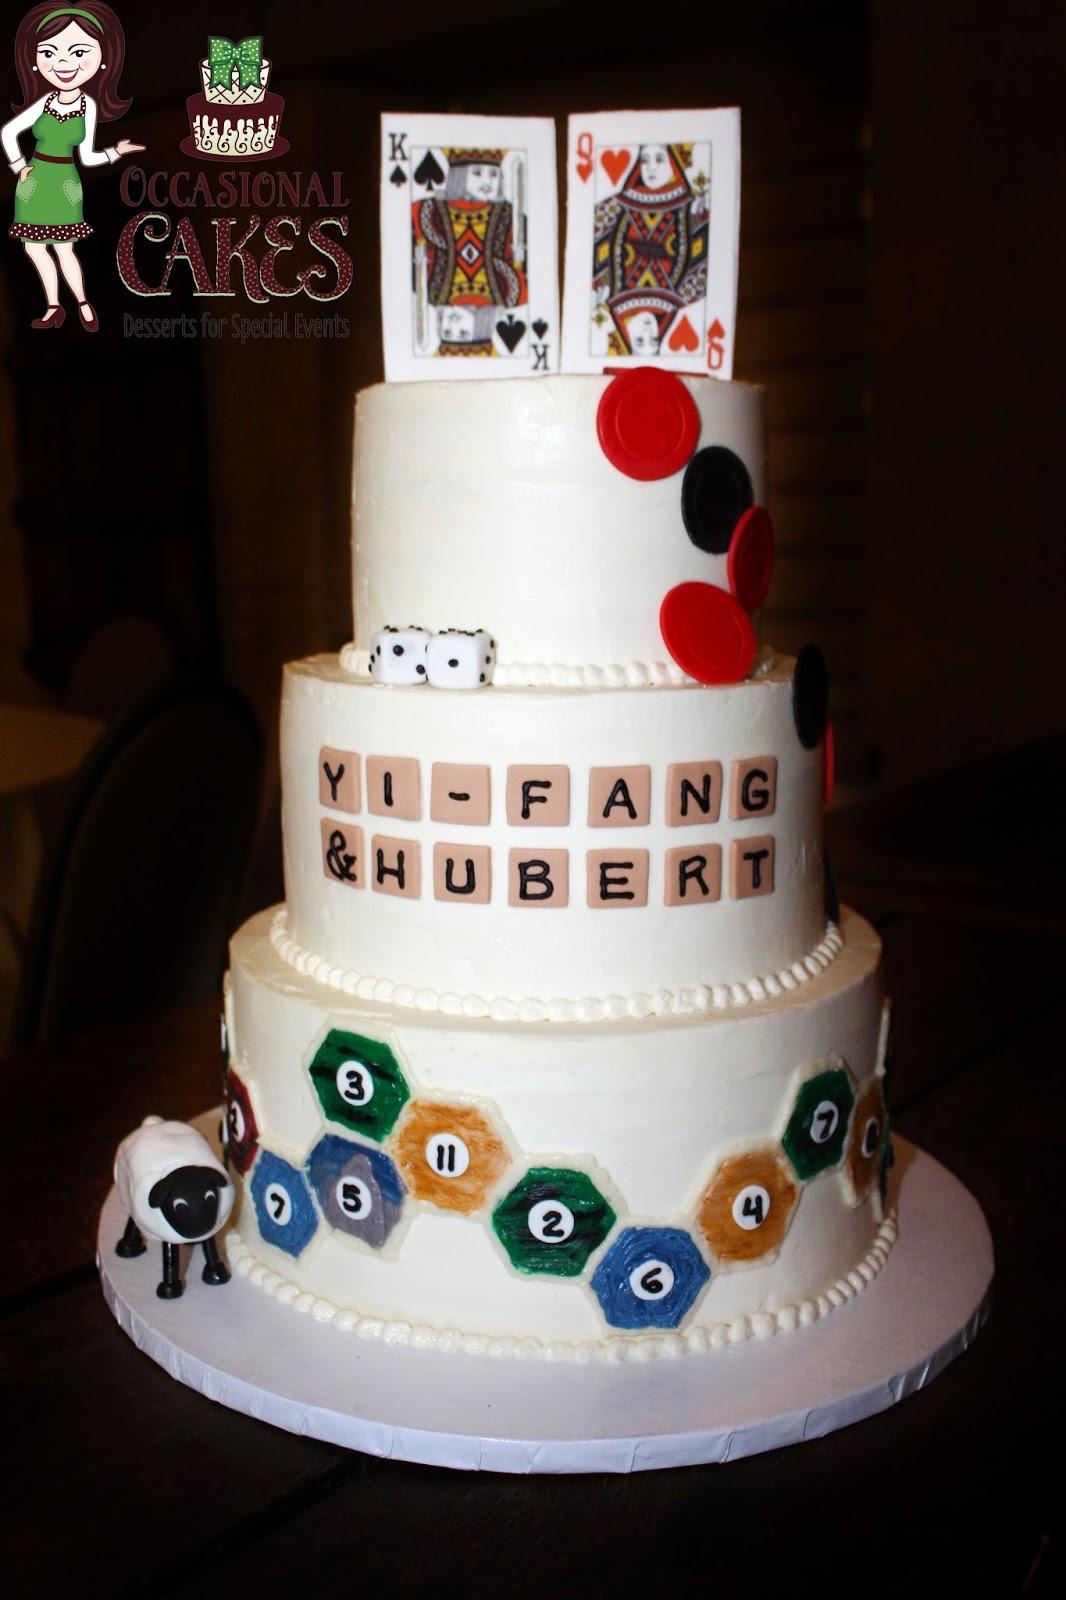 Occasional Cakes Unusual Wedding Cakes